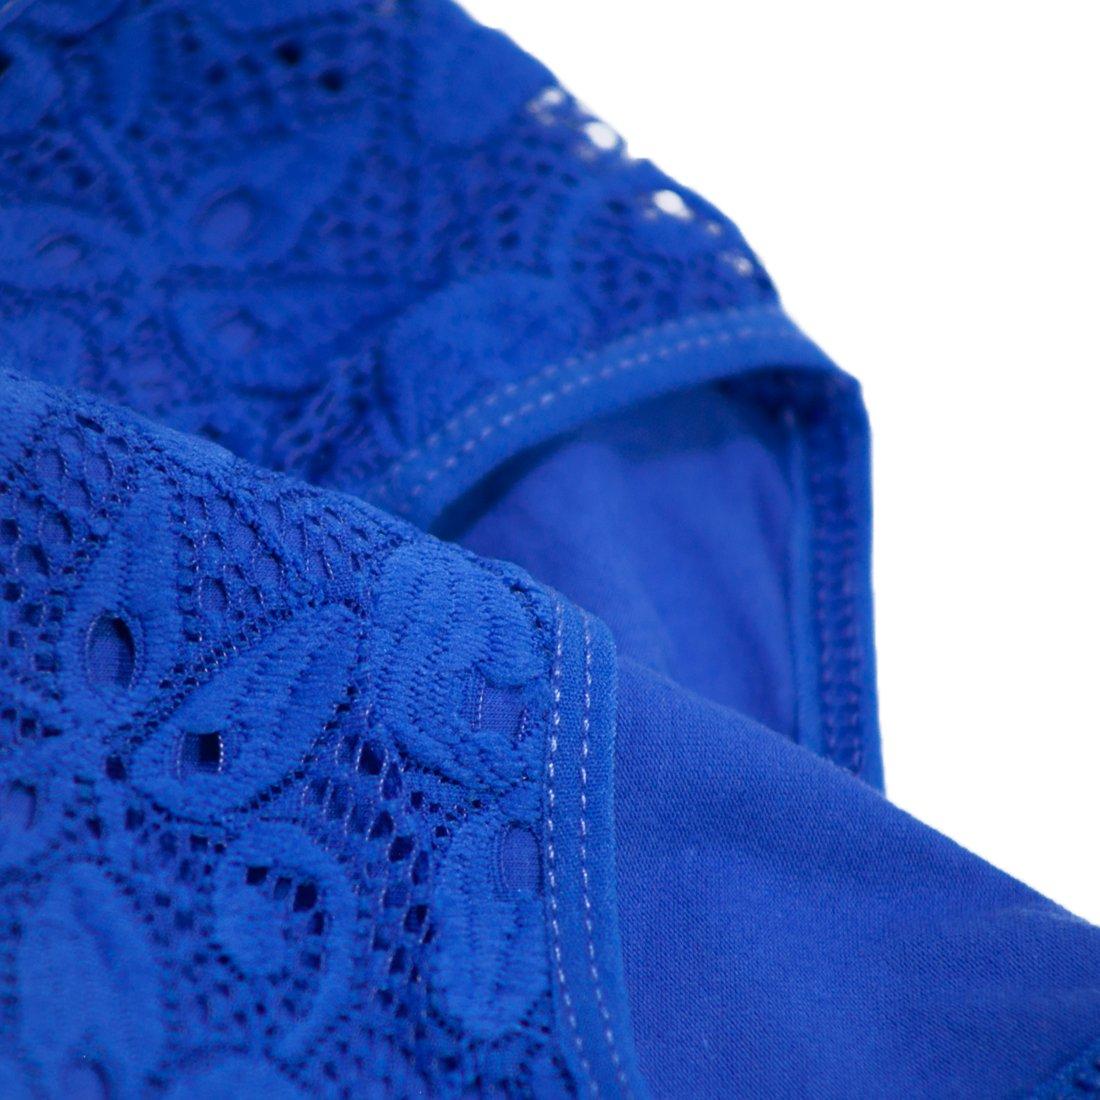 Love Hana Women's Lace Plus Size Brief Panties 4-Pack - XXXL by Love Hana (Image #4)